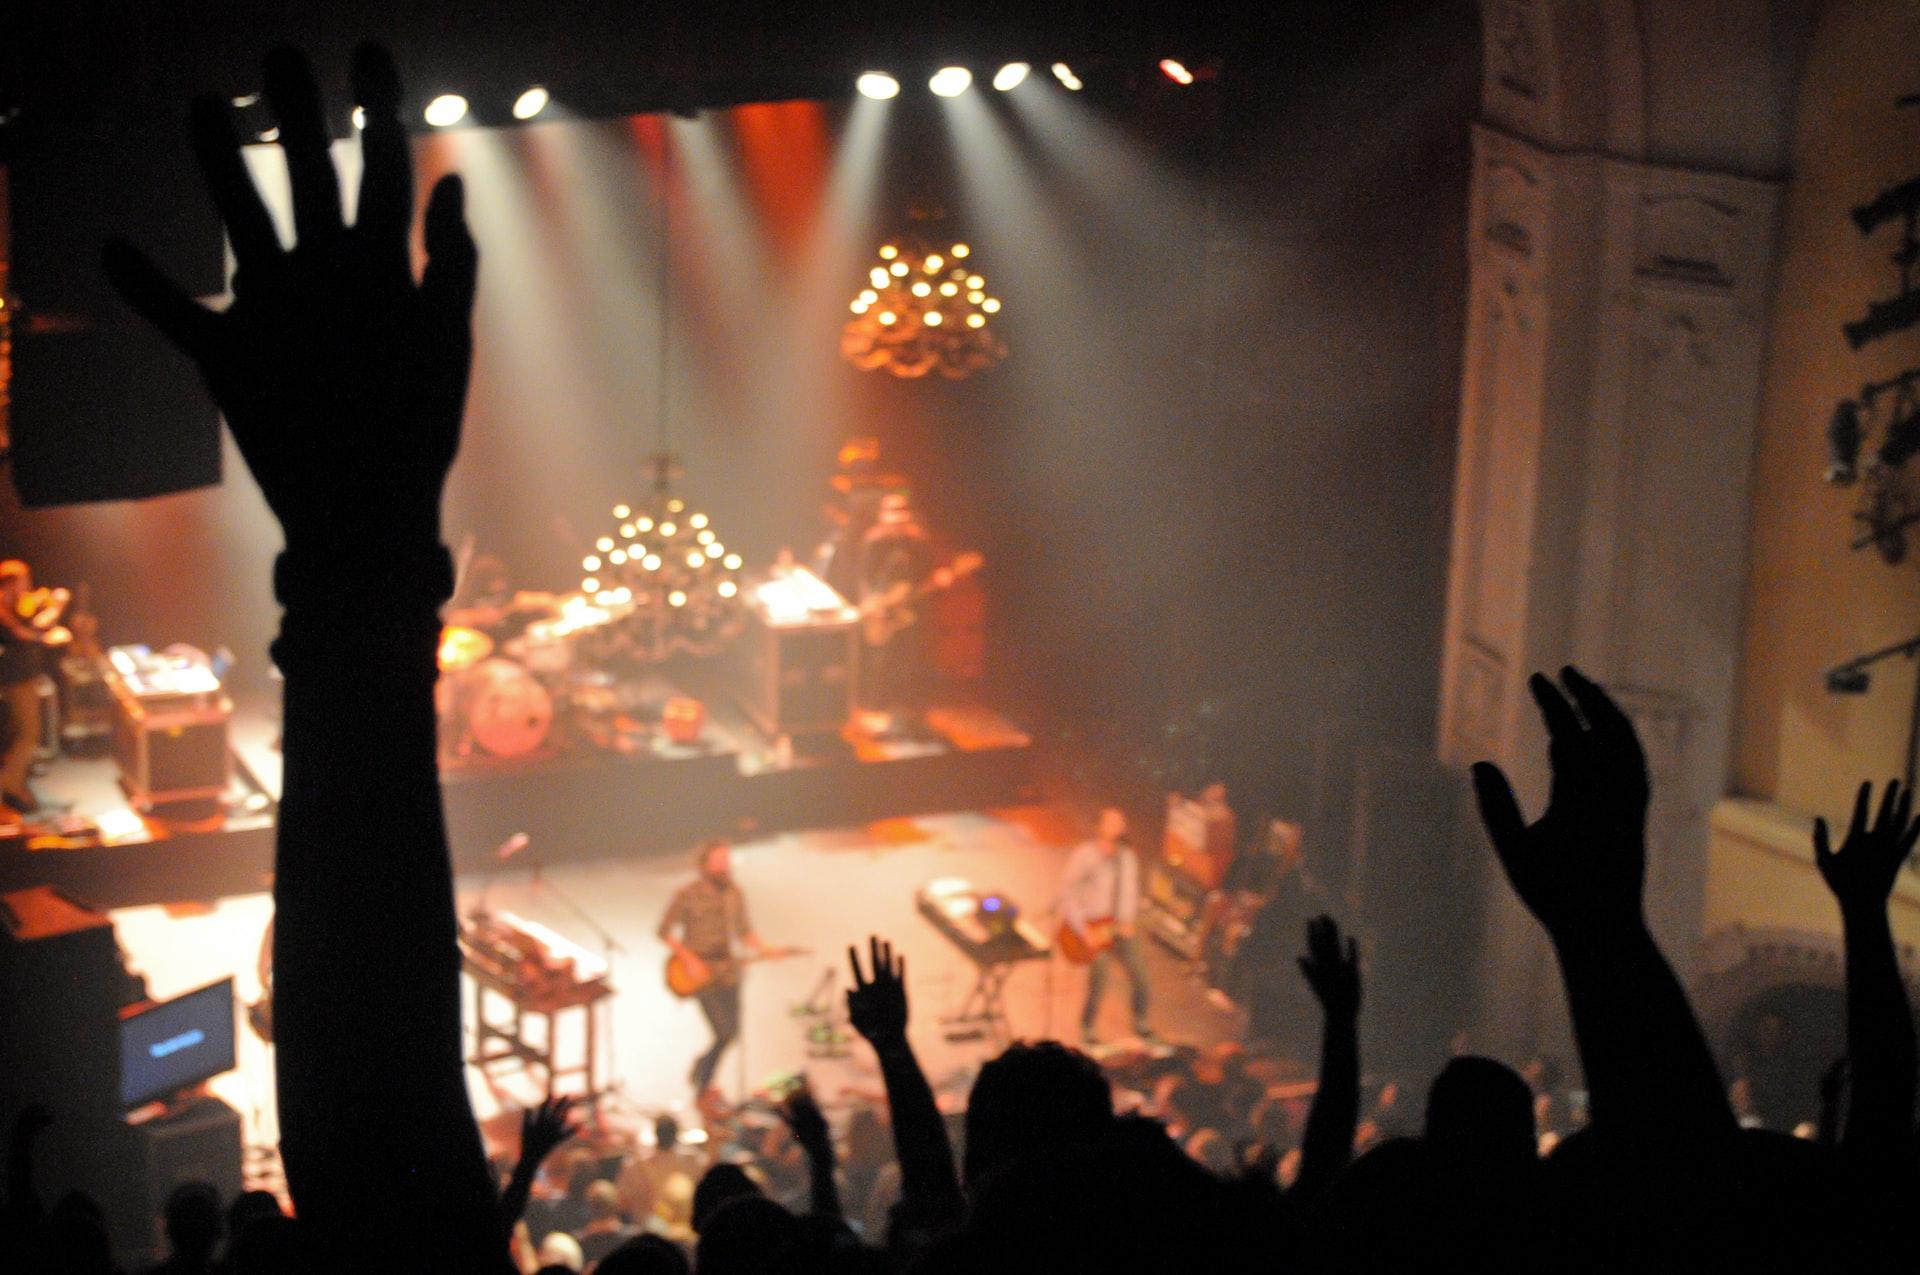 Les concerts virtuels de Mars 20211 min de lecture